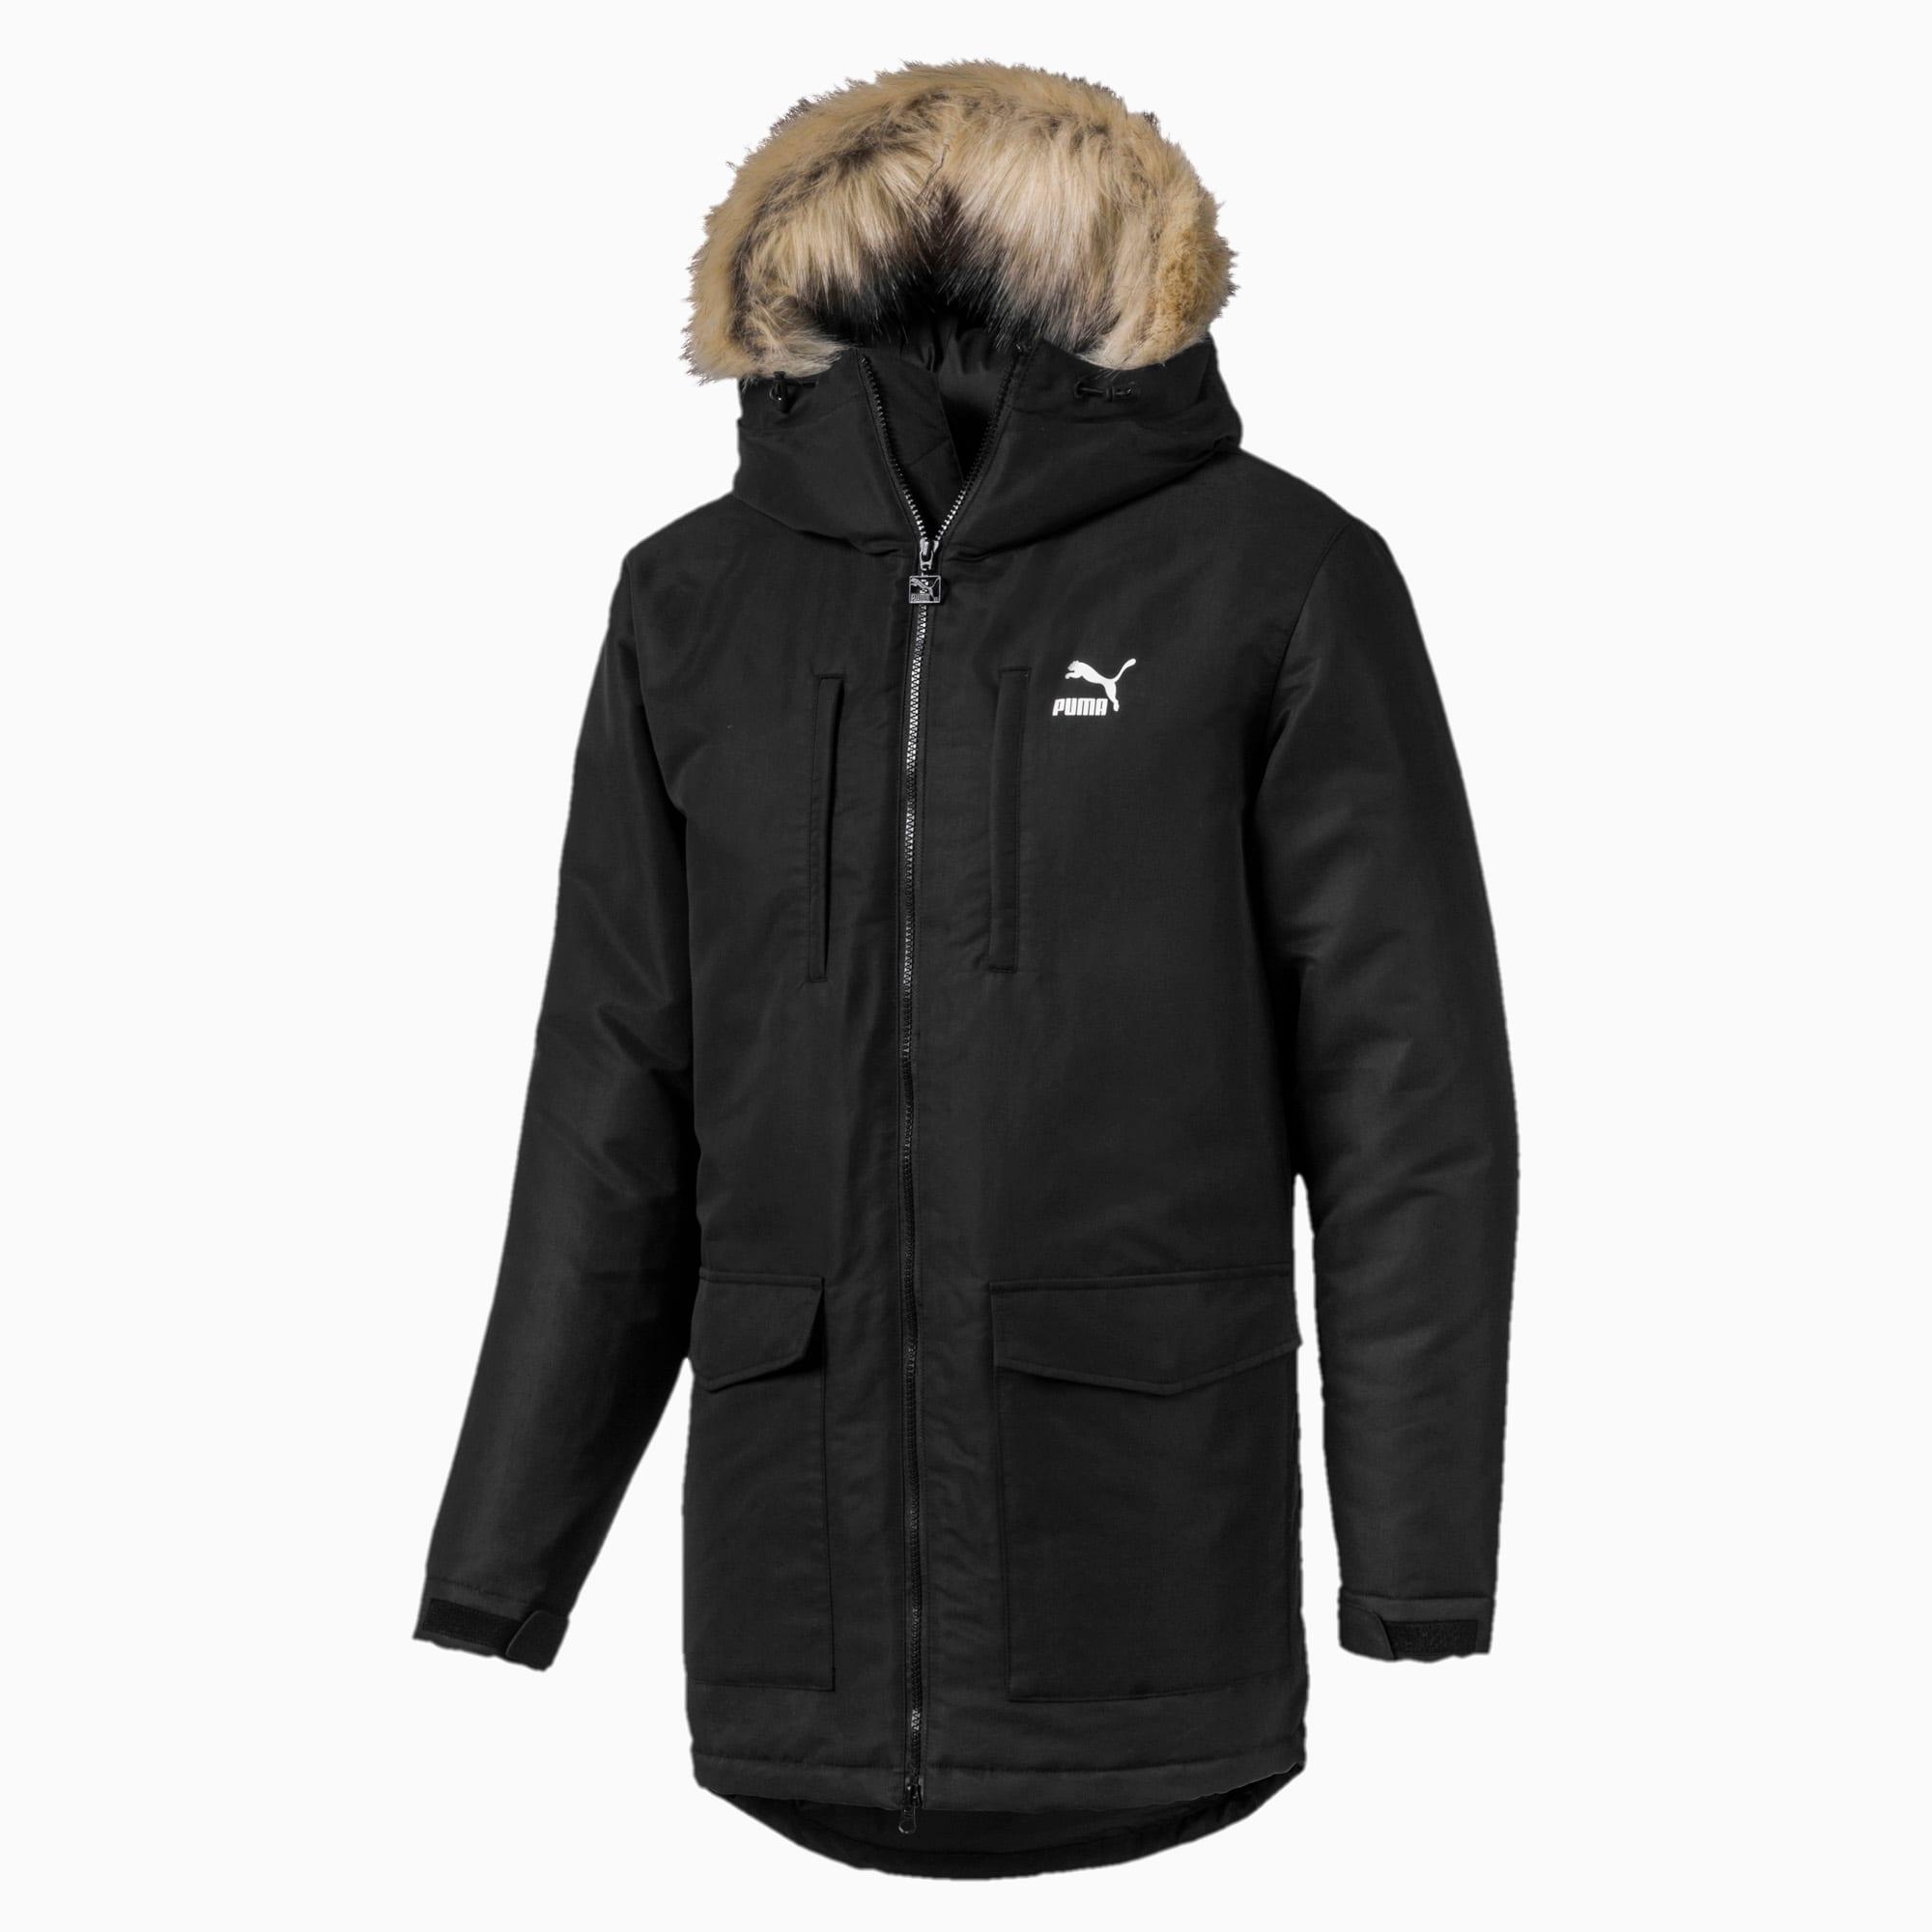 giacche invernali uomo saldi puma